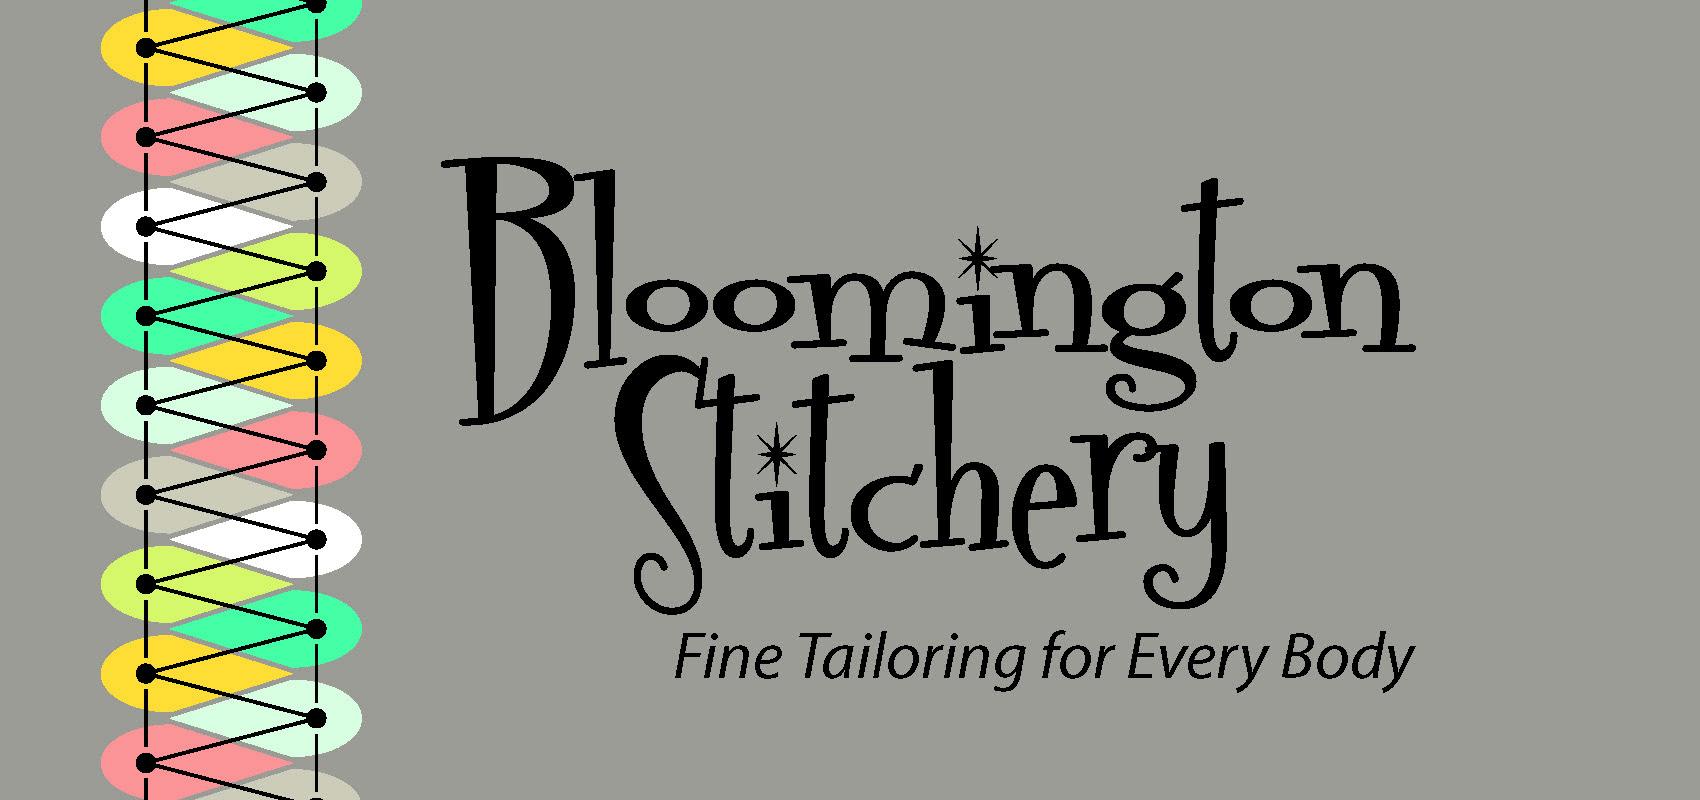 Bloomington Stitchery logo_Page_1 (3).jpg